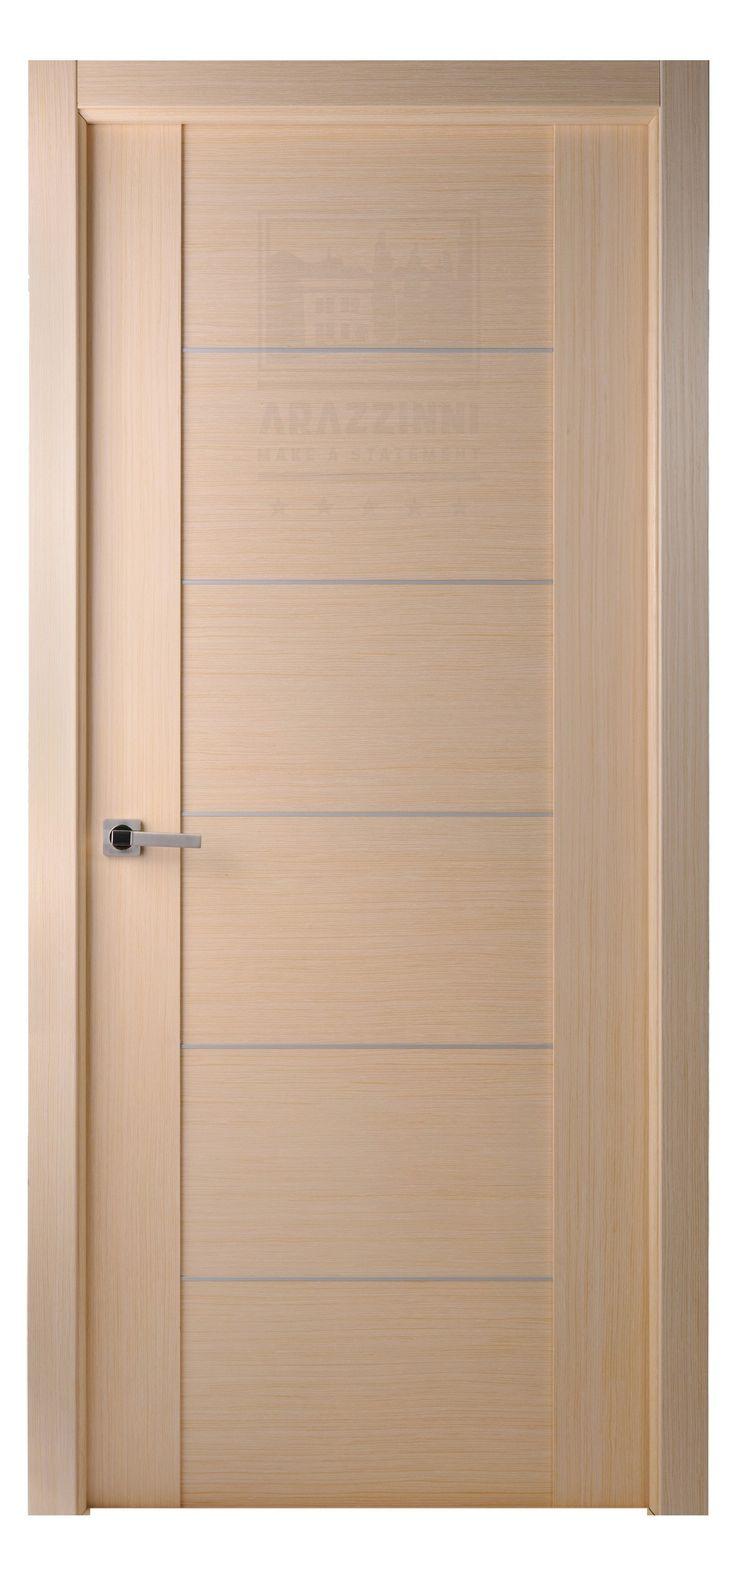 51 best images about exotic wood veneer doors on pinterest for Interior flush wood doors